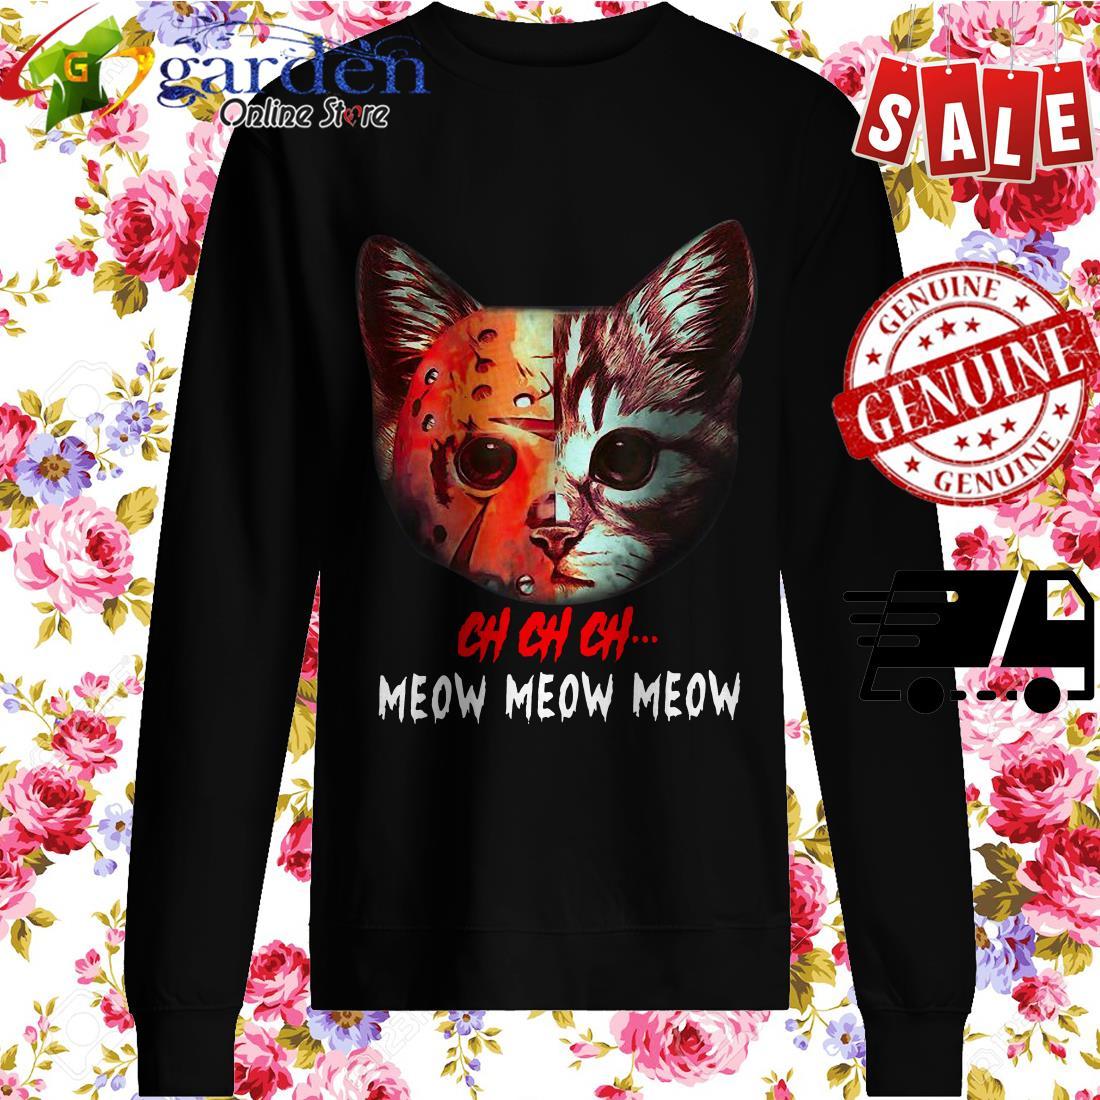 Jason Voorhees Cat Ch Ch Ch Grr Grr Grr sweater